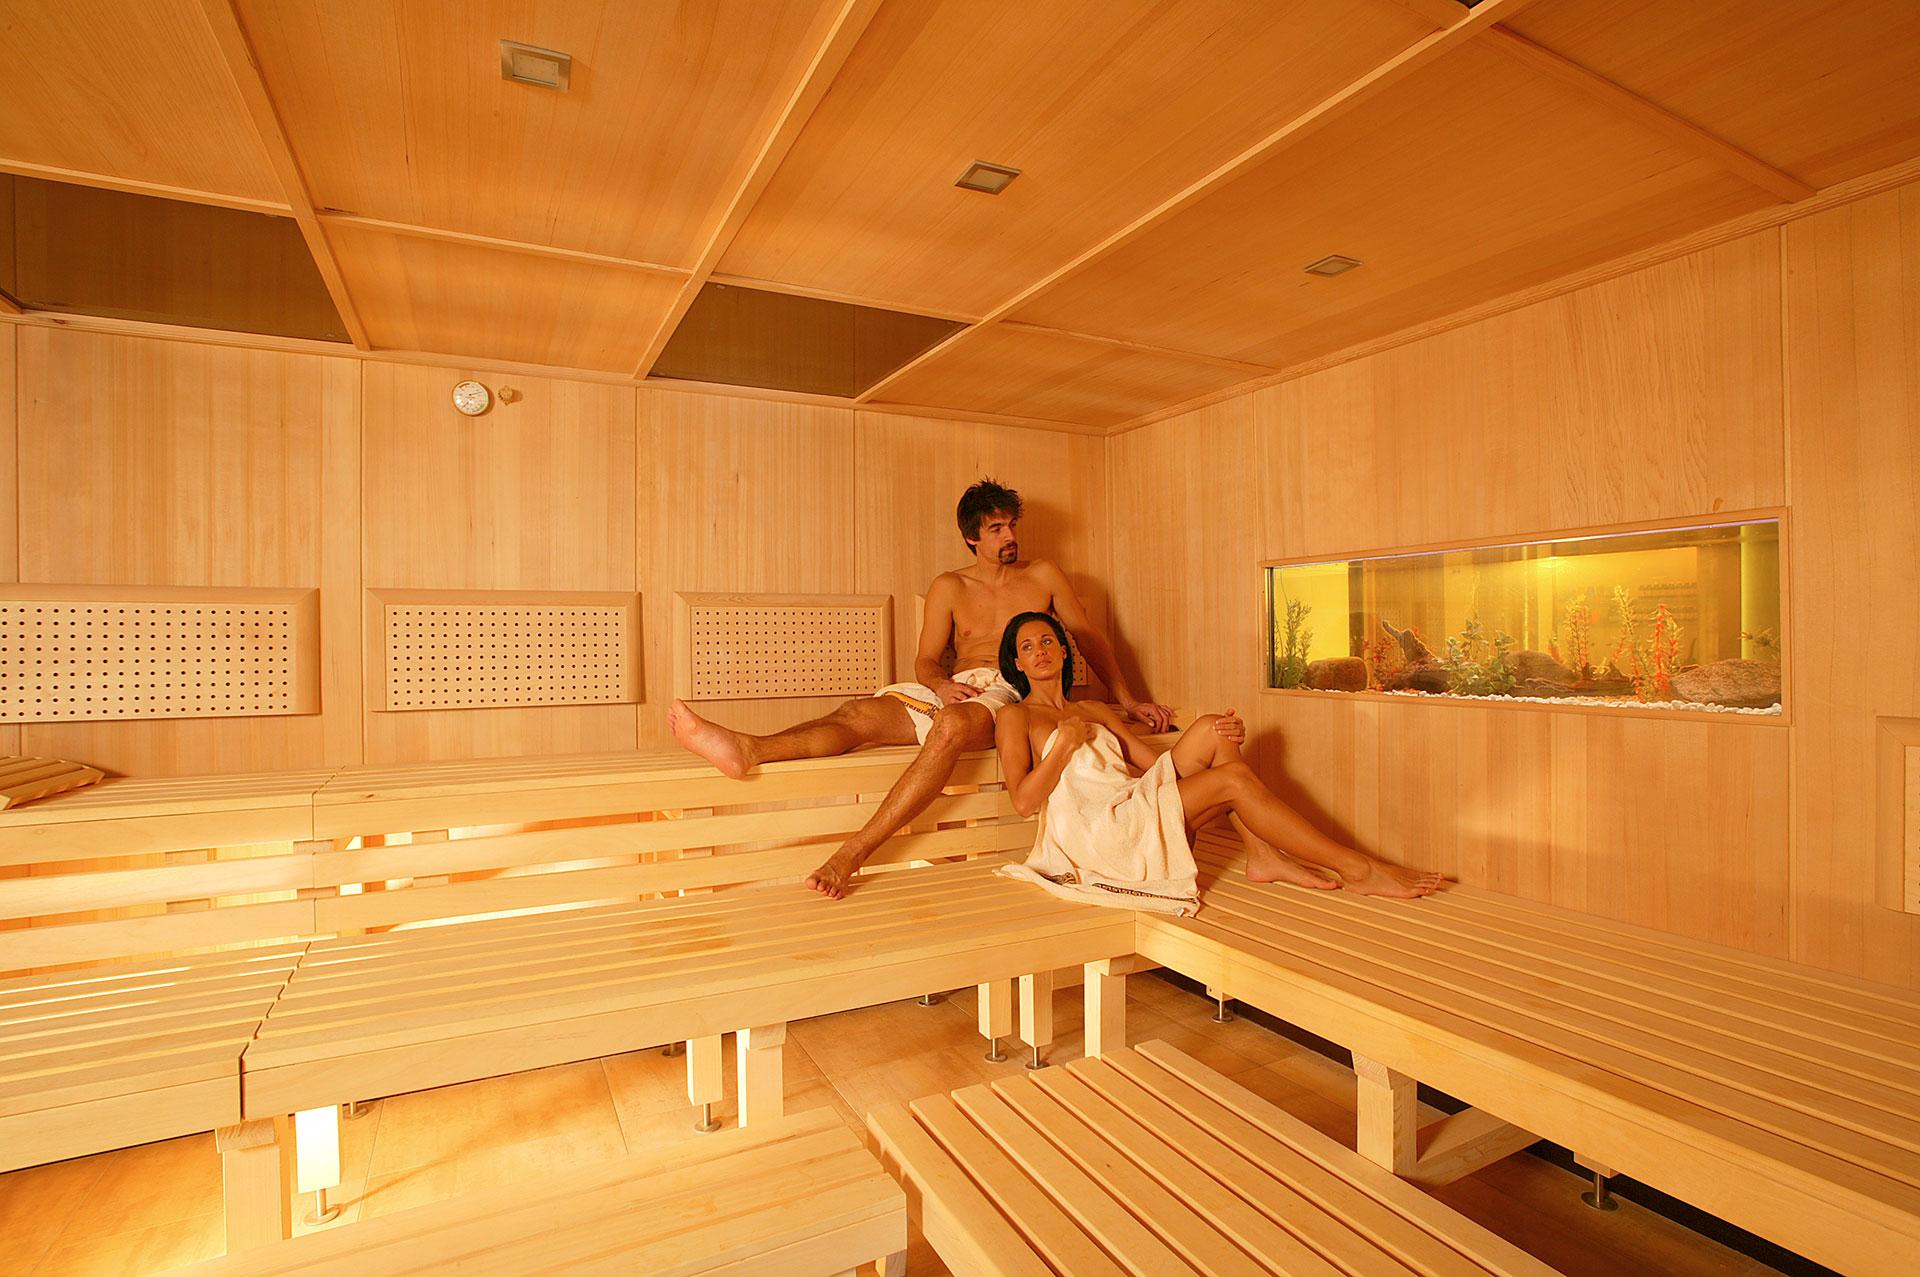 The sauna world in the Hotel Jerzner Hof